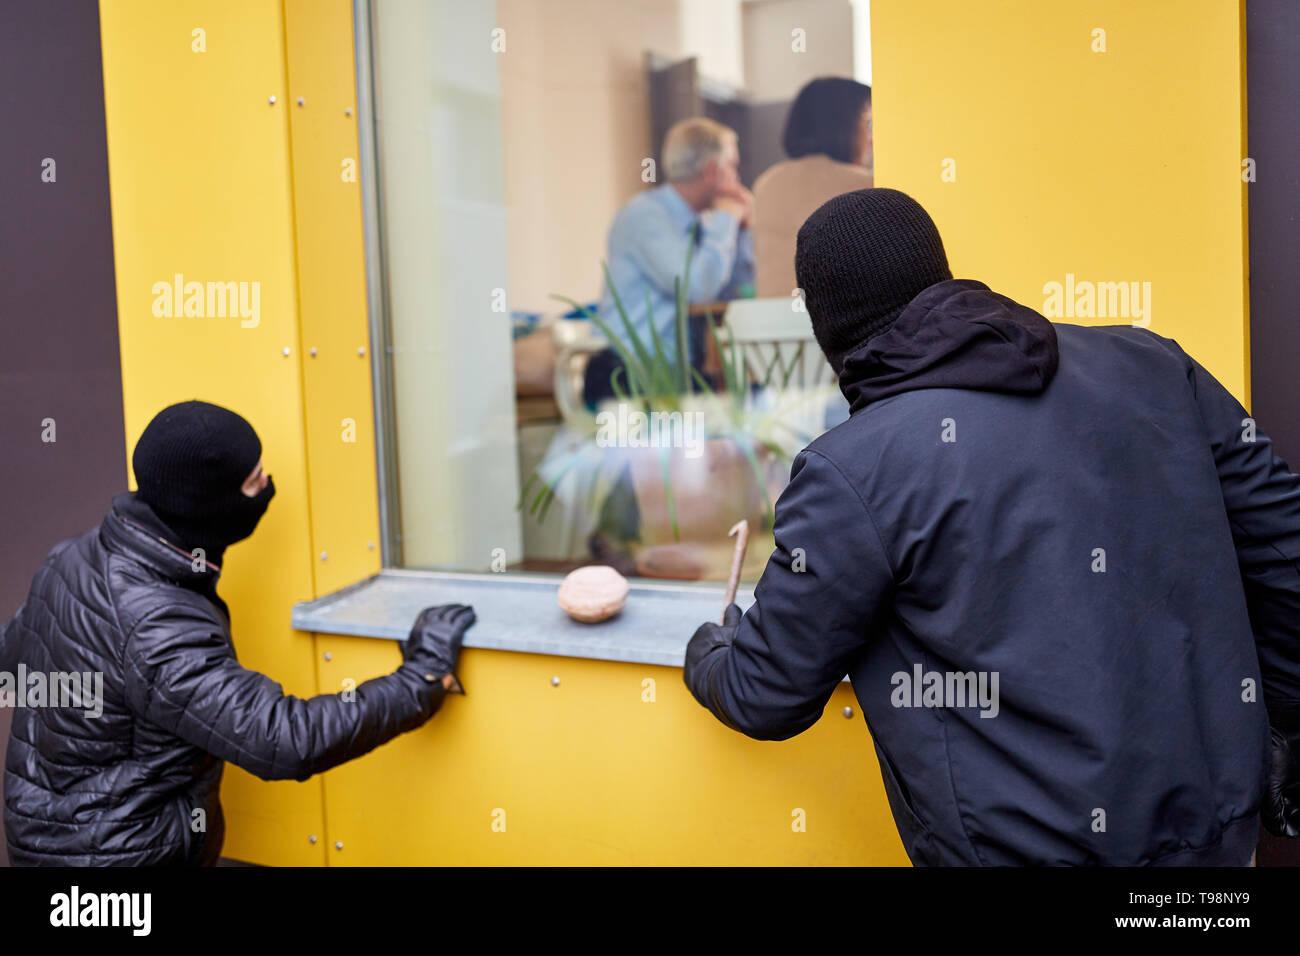 Burglars peek residents through a window from the house before a burglary - Stock Image